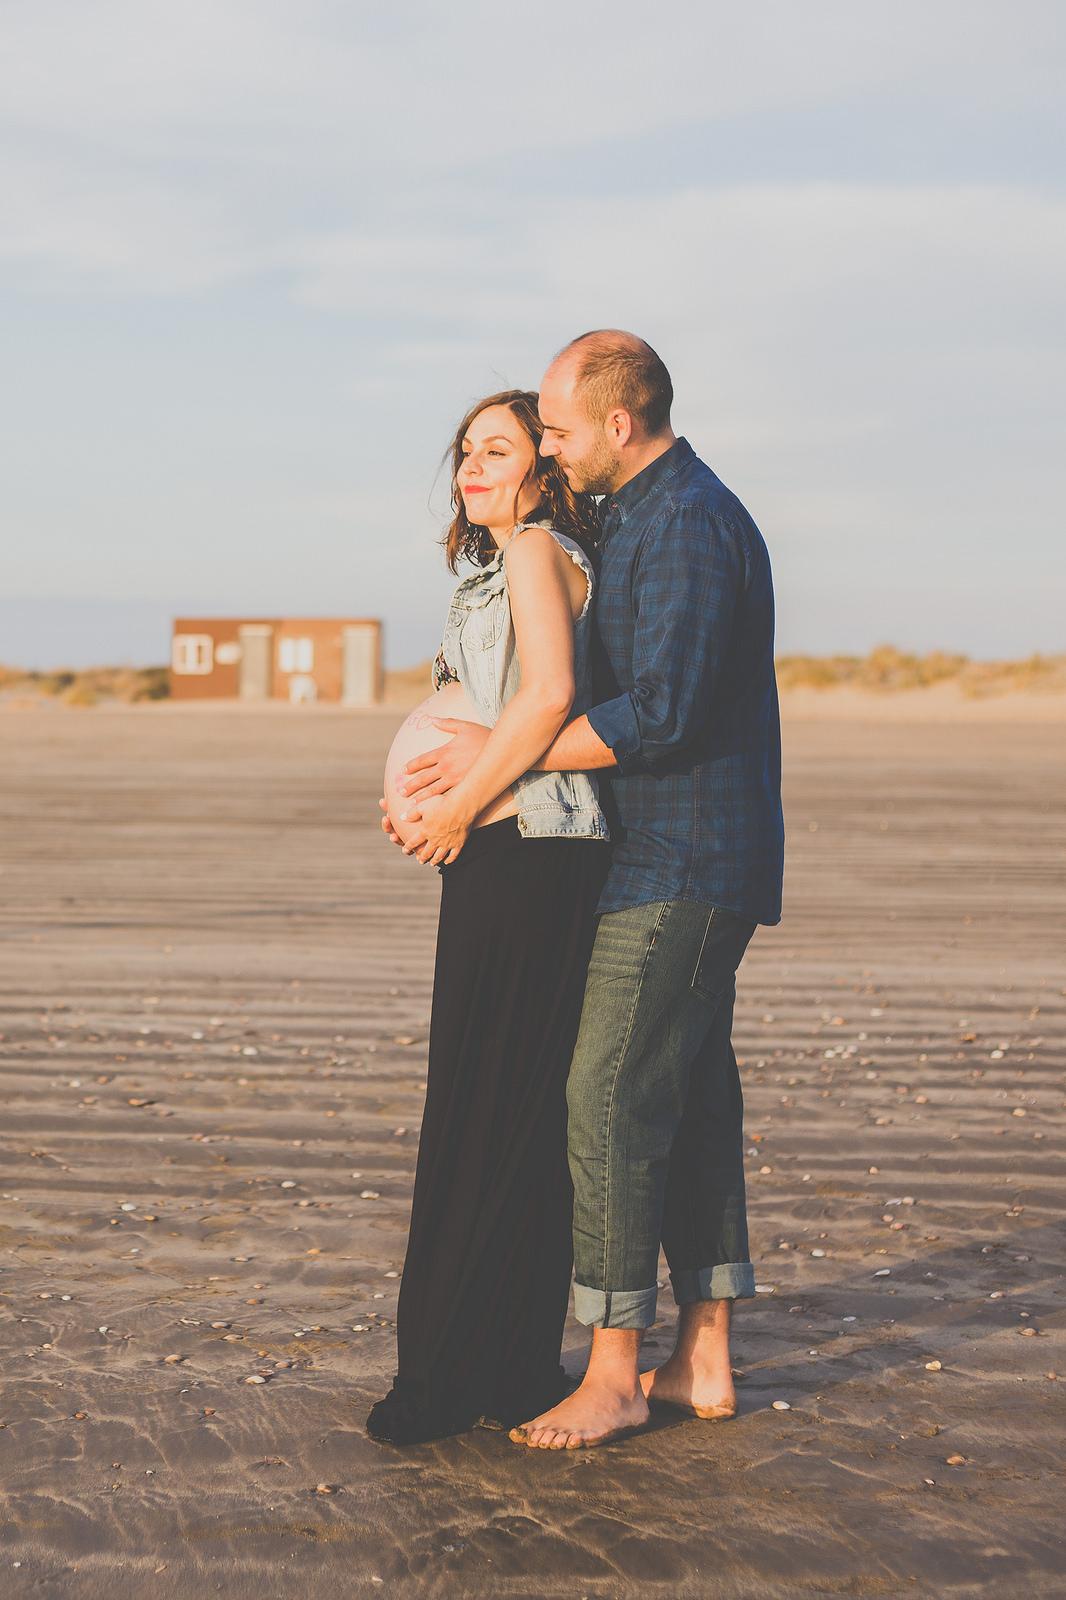 sesion embarazo silvia orduna fotografia huelva playa 36